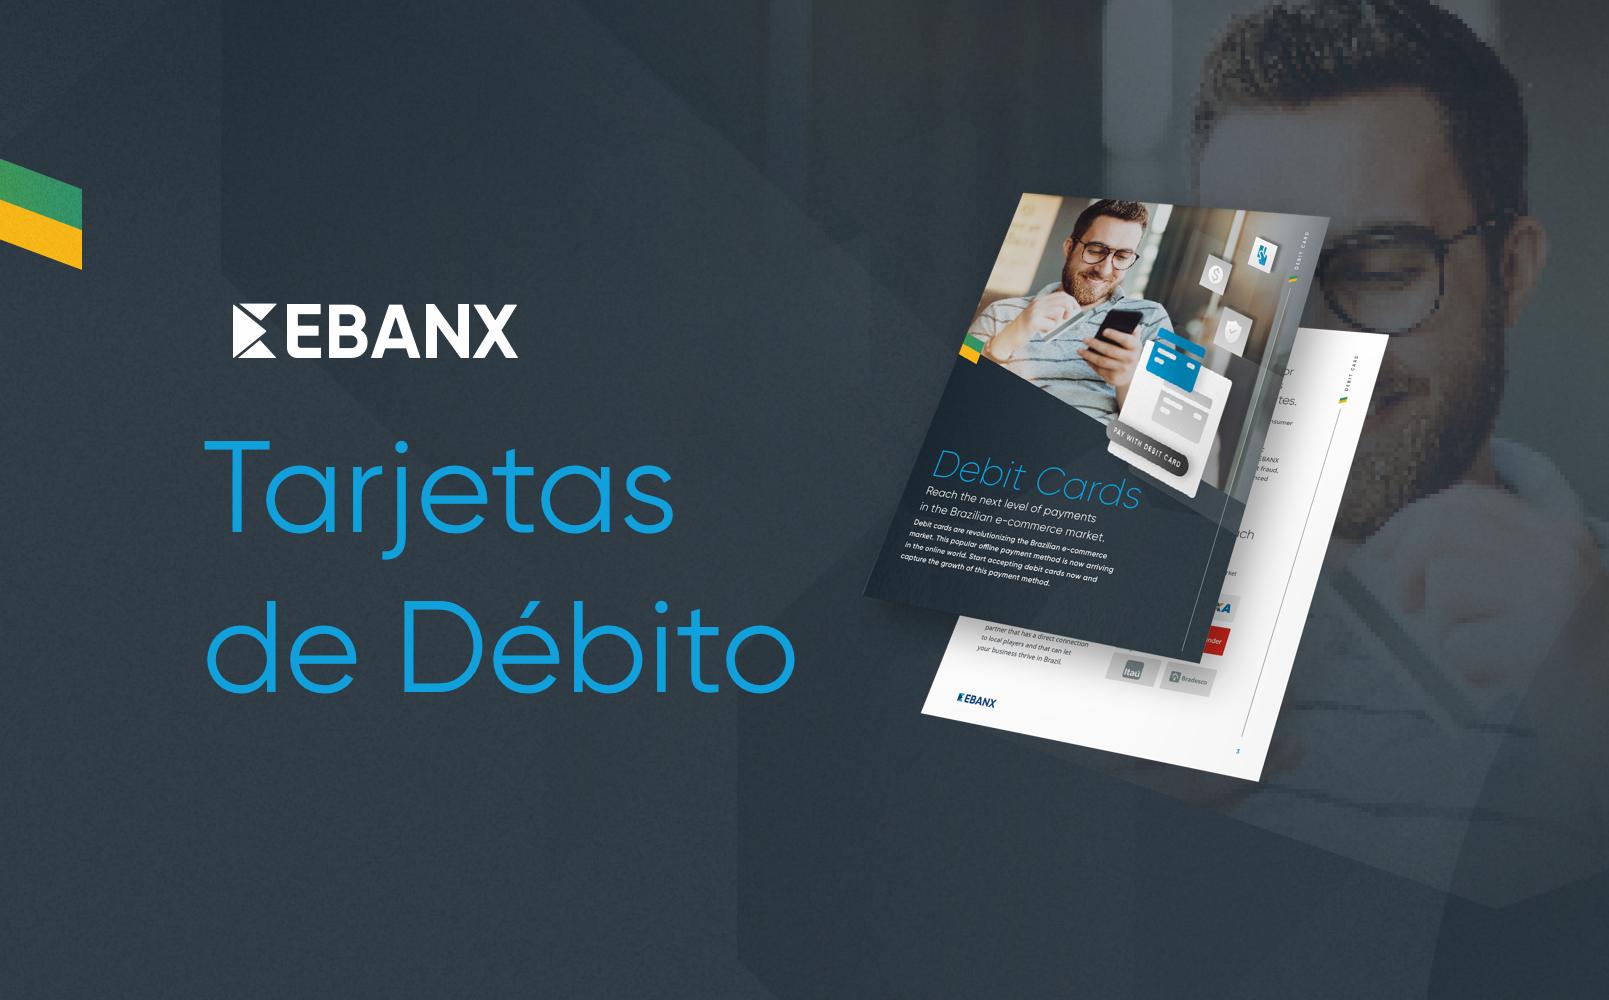 Banner-Debit cards es